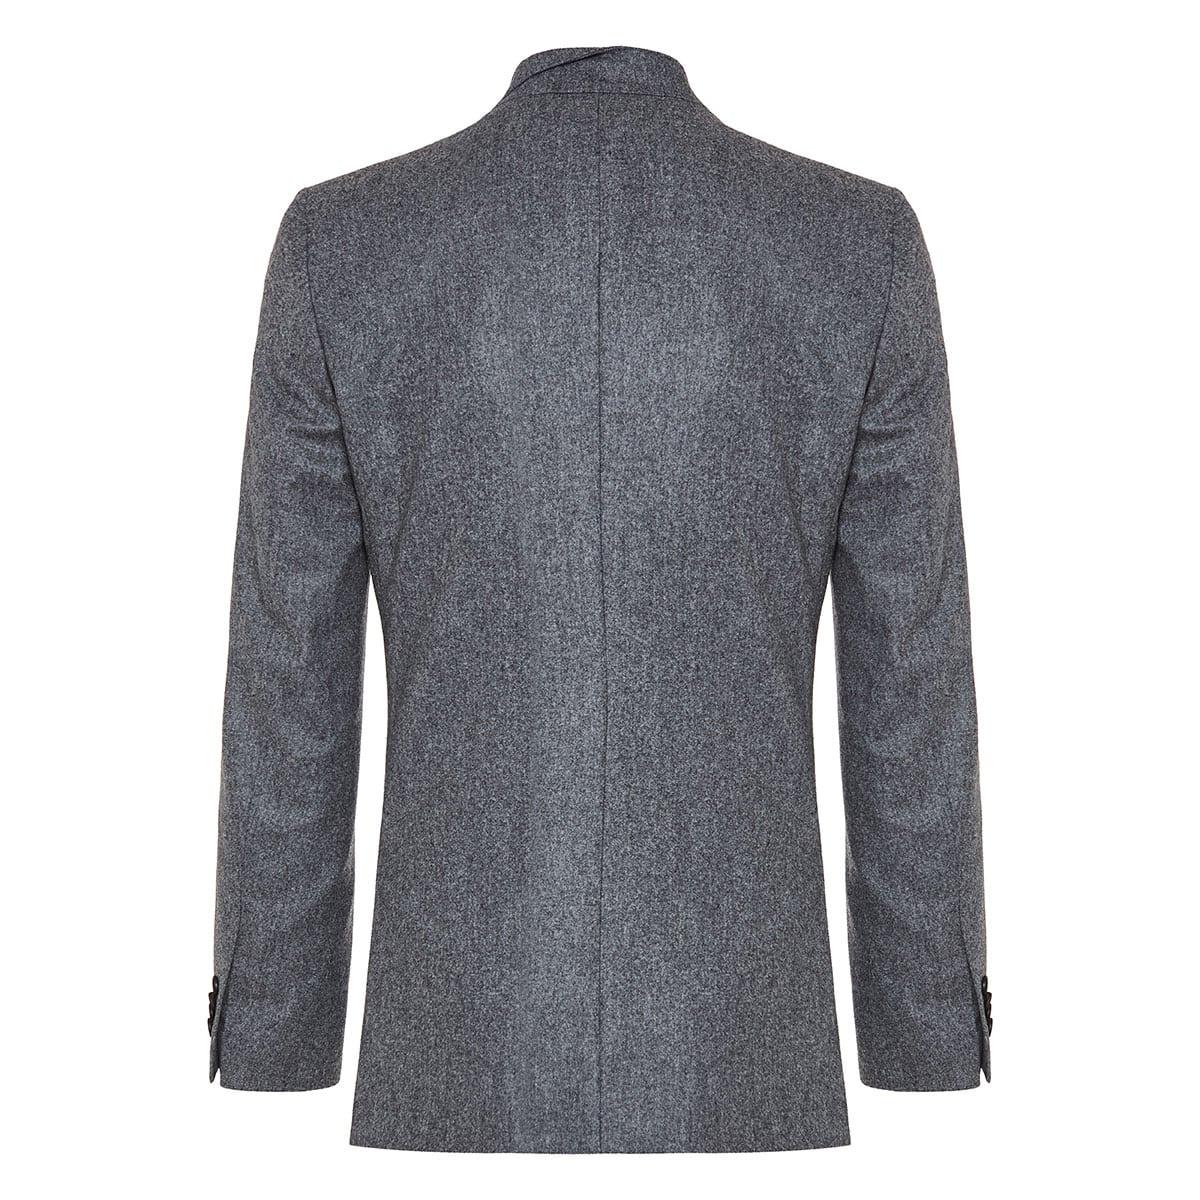 Asymmetric double-breasted blazer